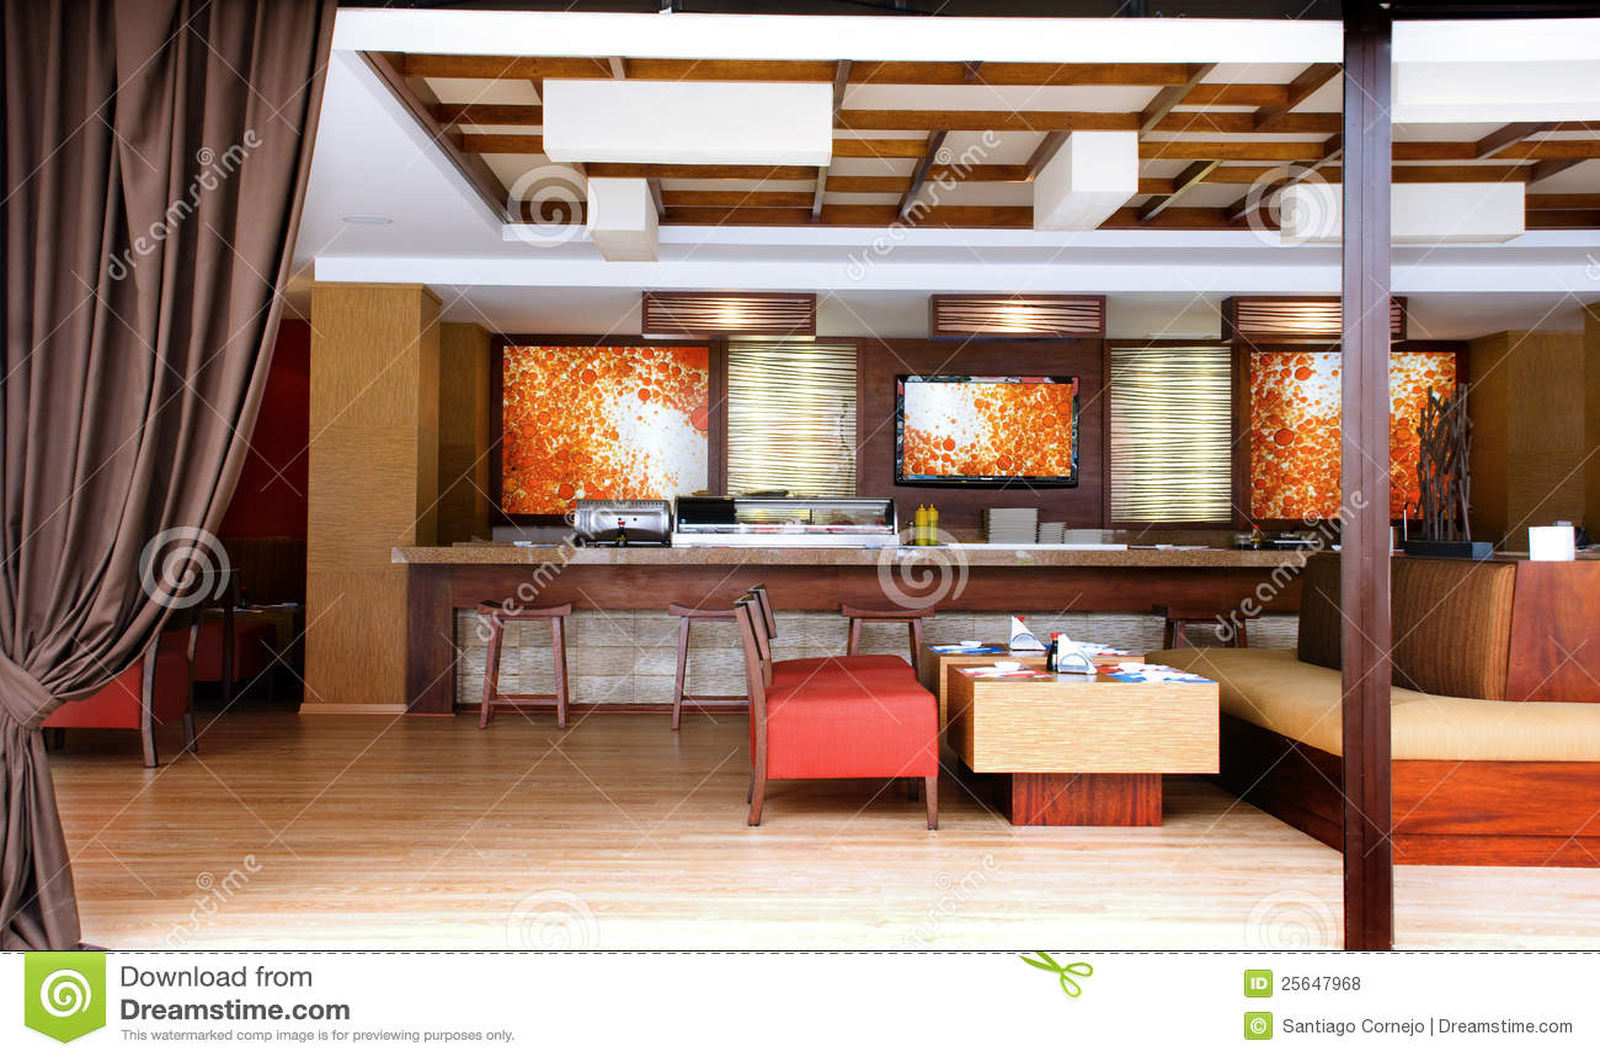 Interior Design Restaurant Royalty Free Stock Photos Image 25647968